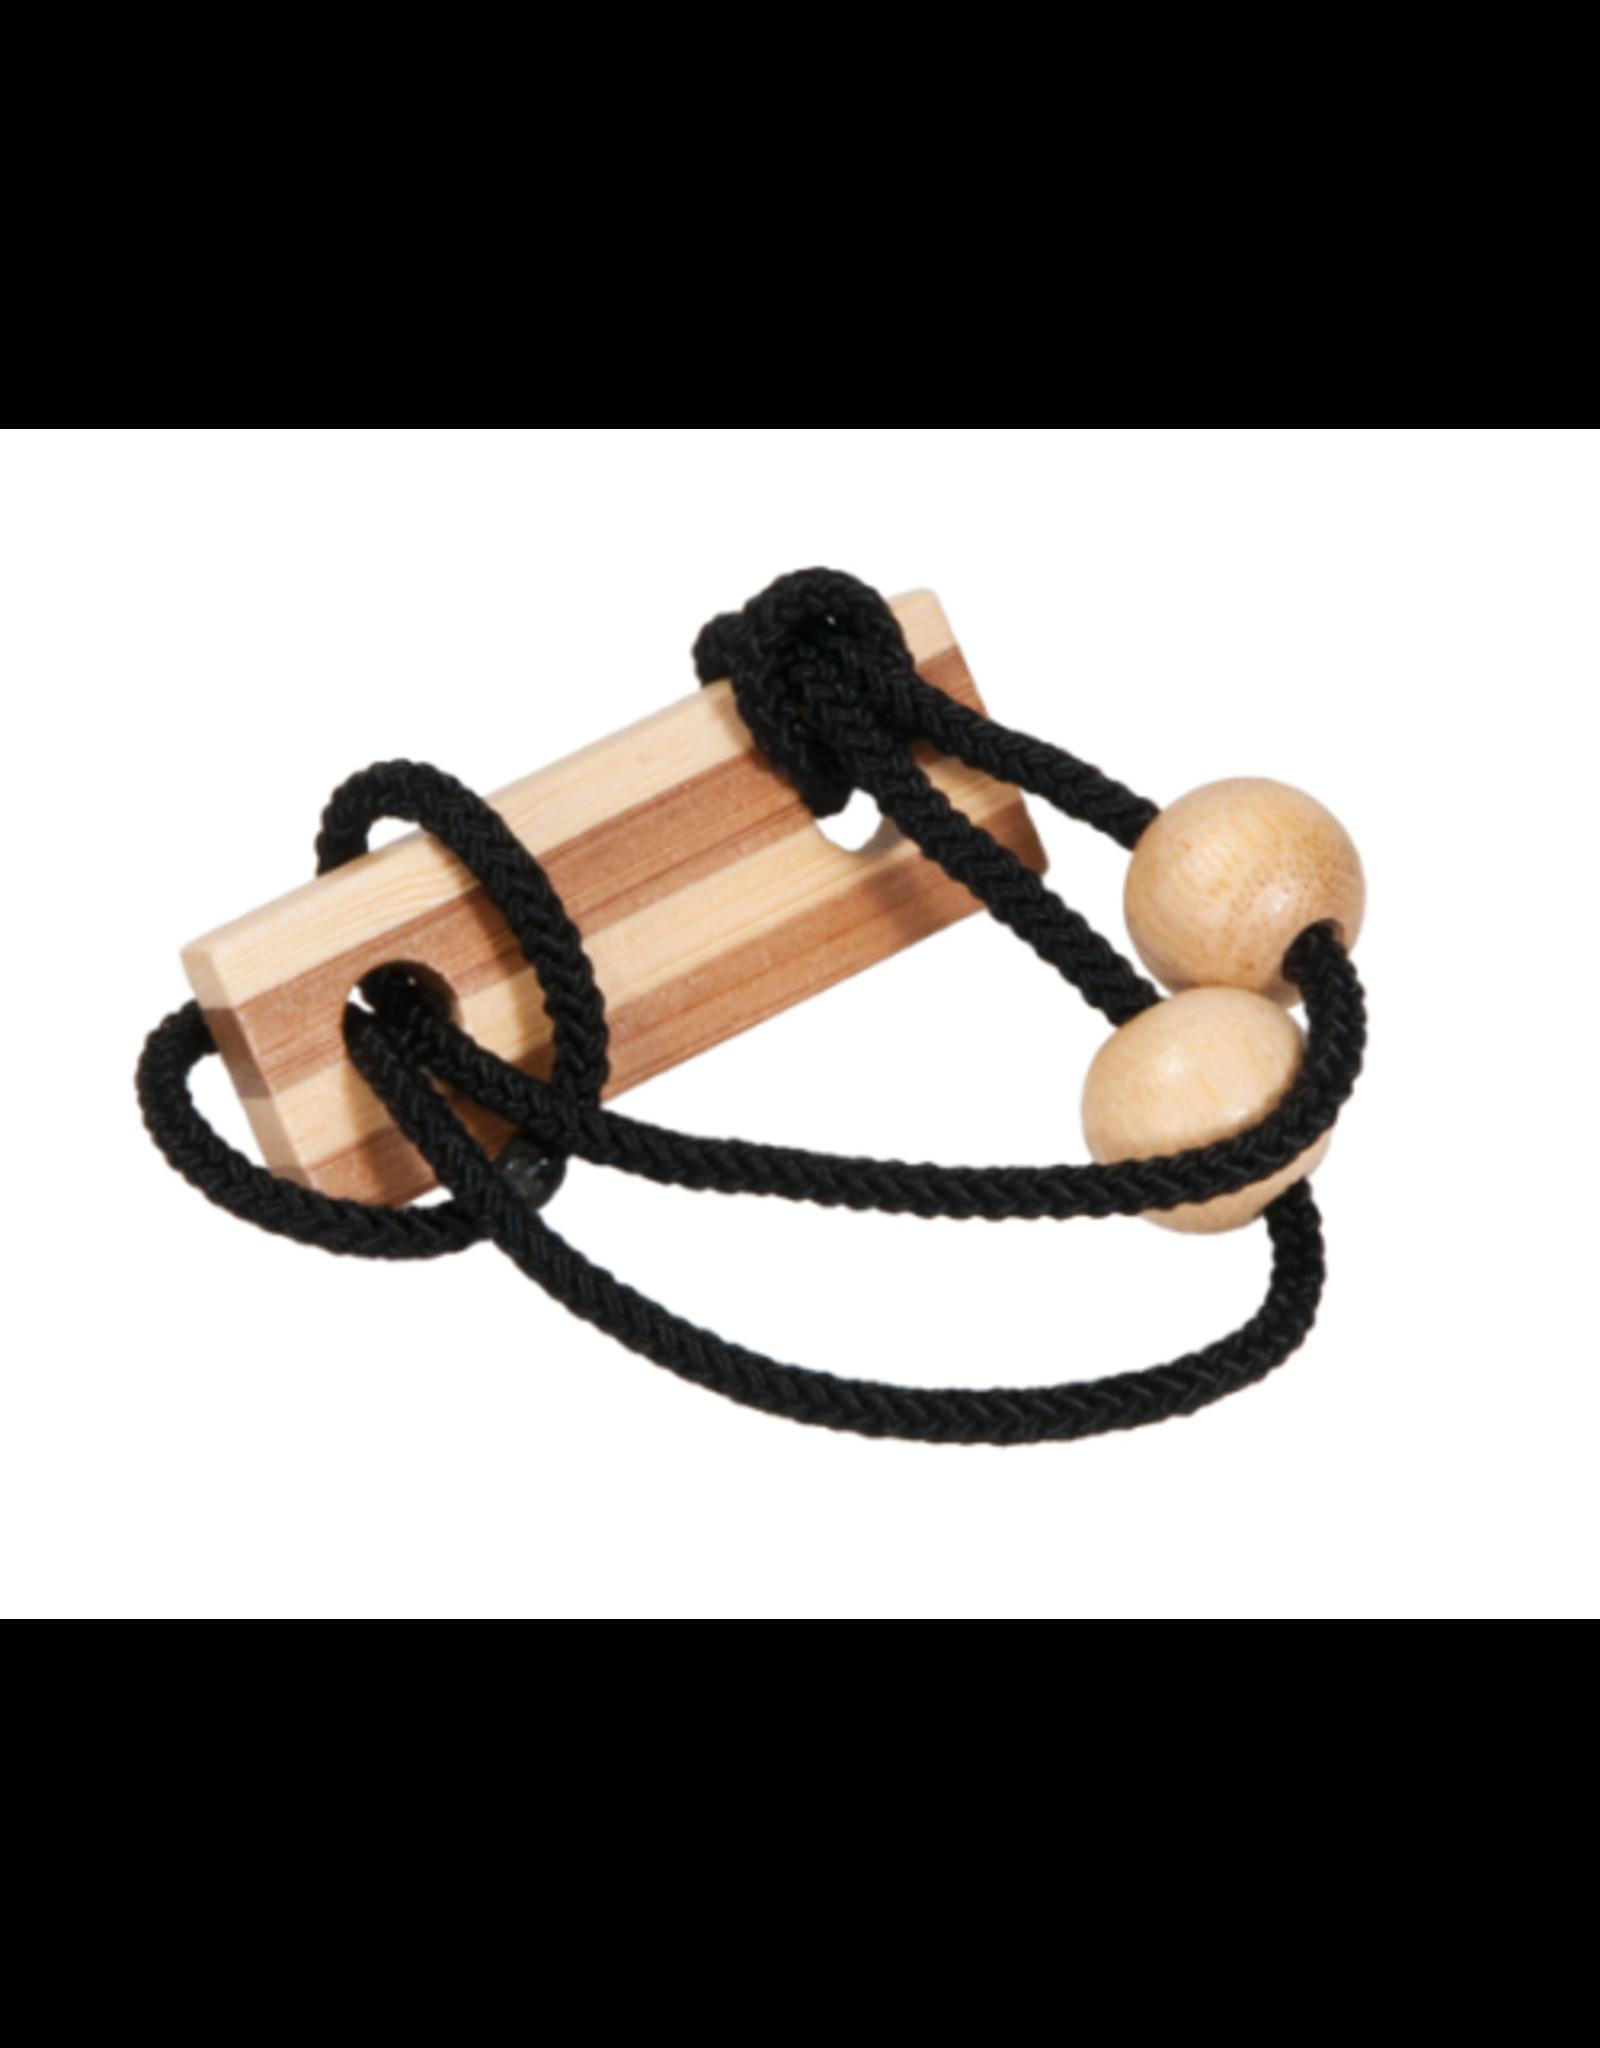 Fridolin IQ Test: Bamboo String Puzzle